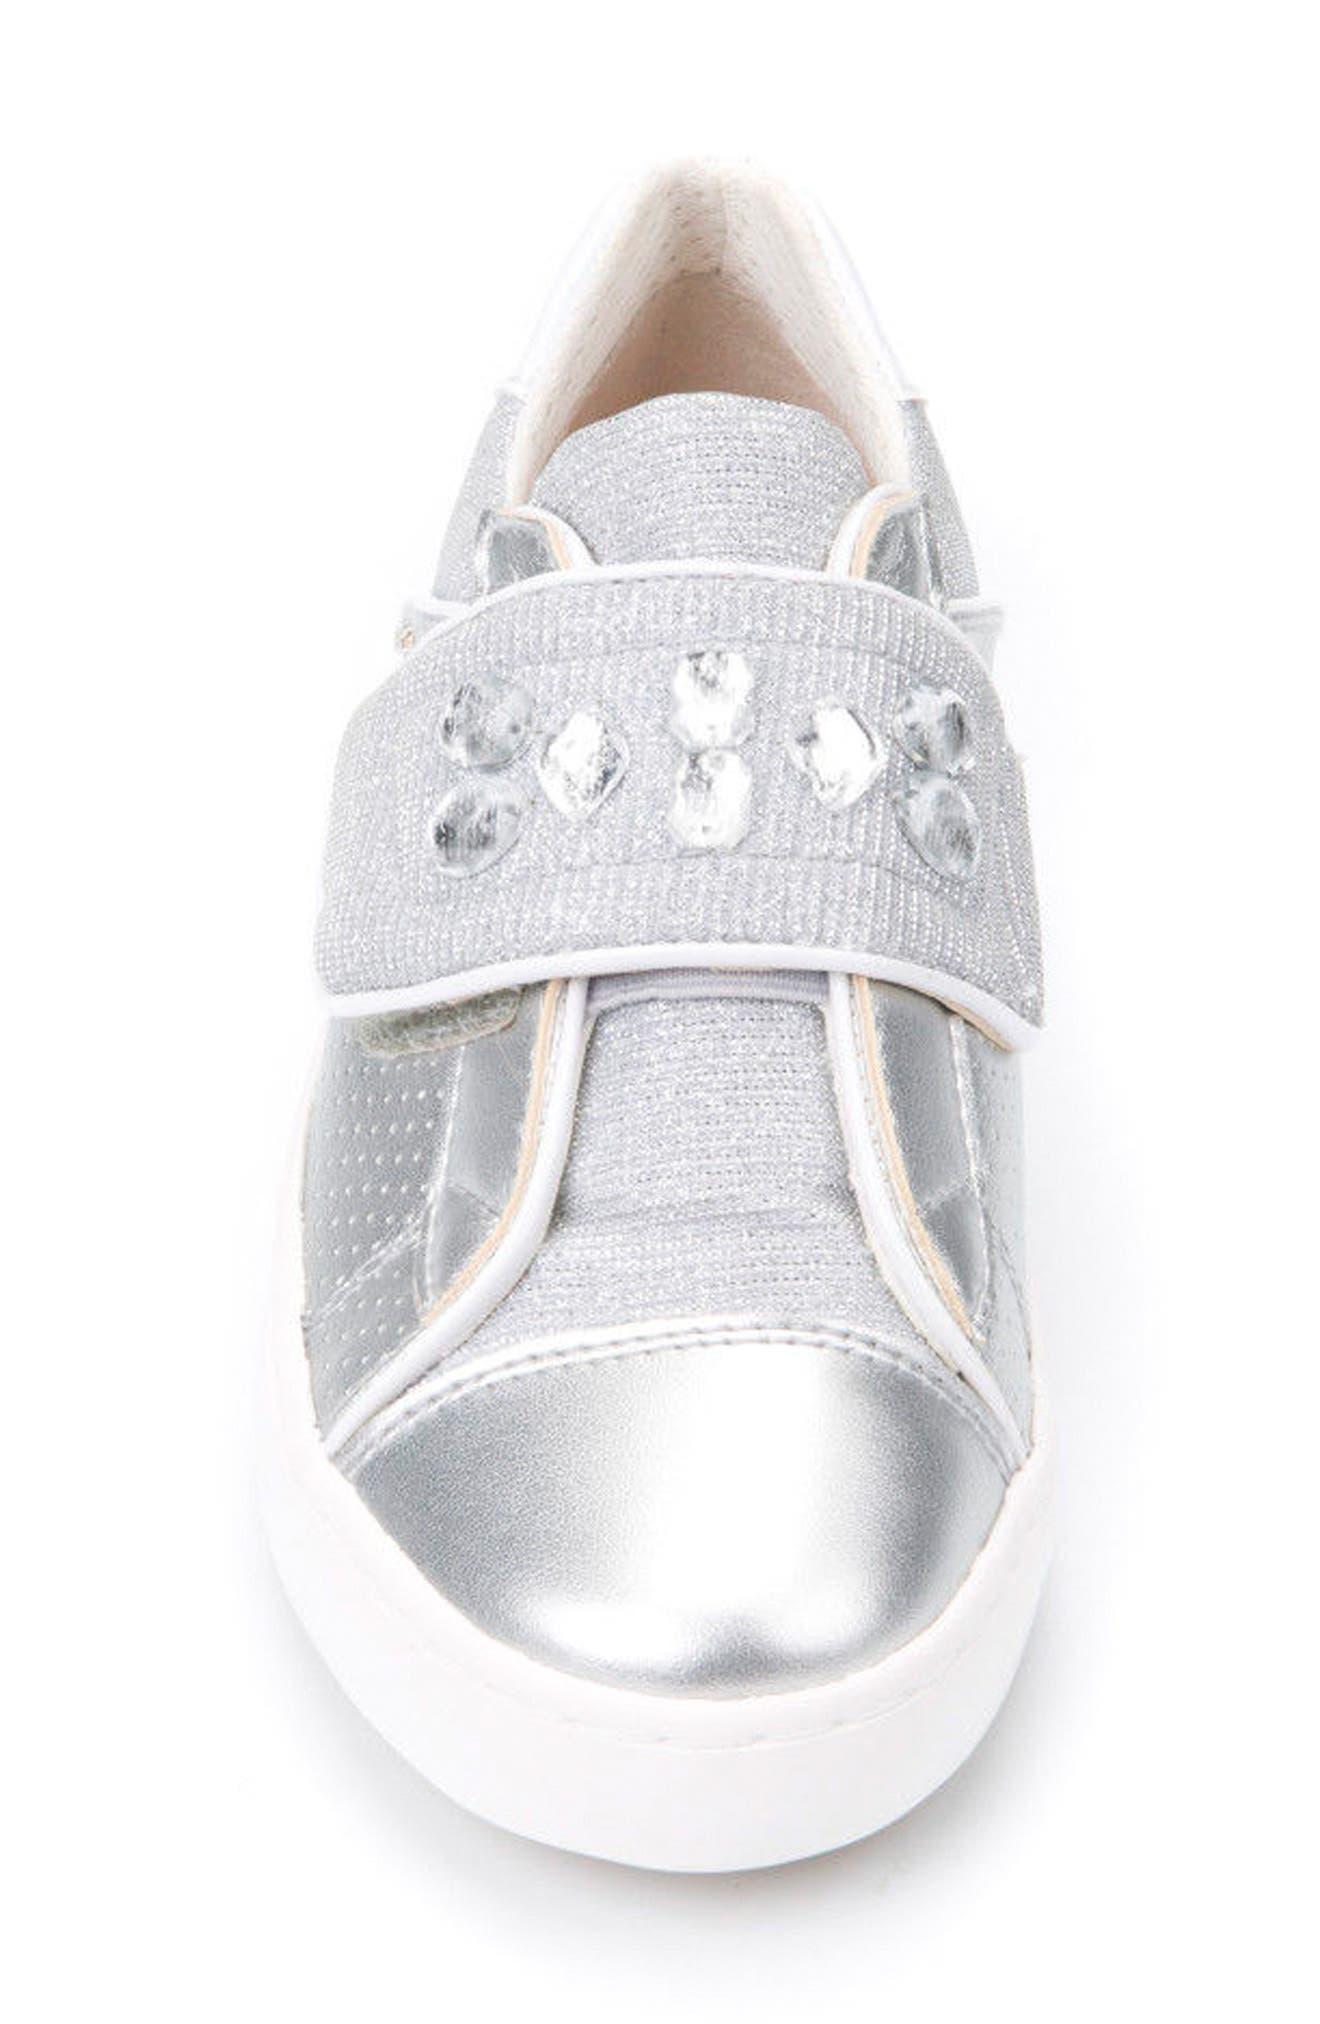 Kilwi Metallic Embellished Sneaker,                             Alternate thumbnail 4, color,                             SILVER